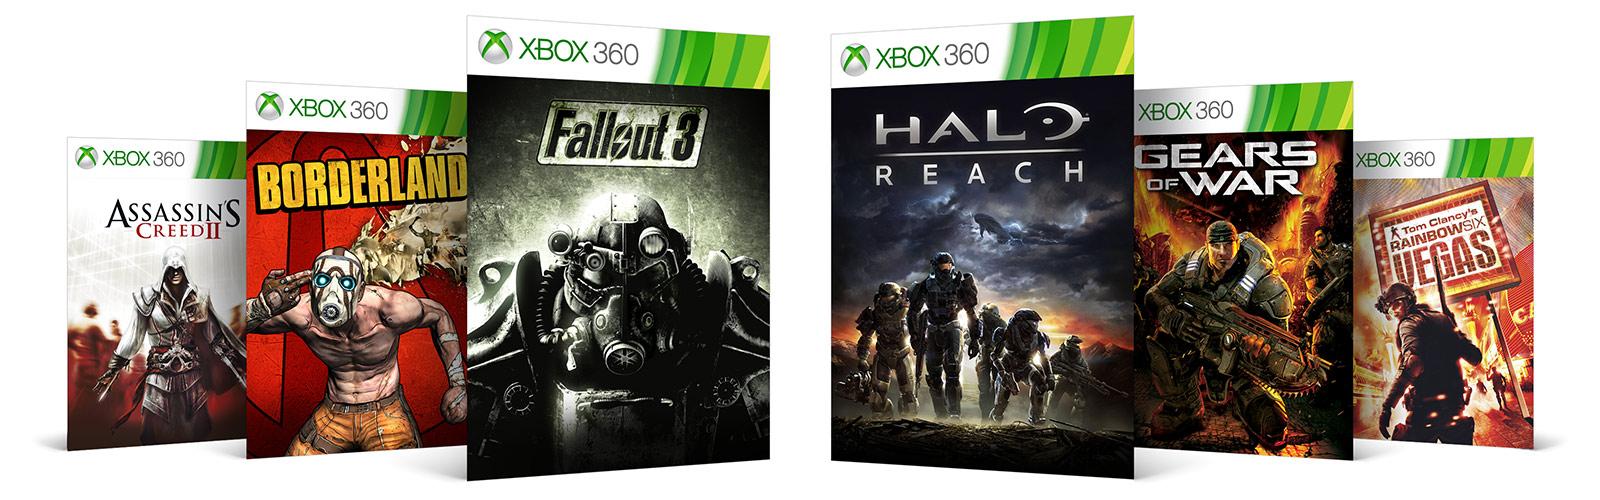 Игры 2016 года на xbox 360 список